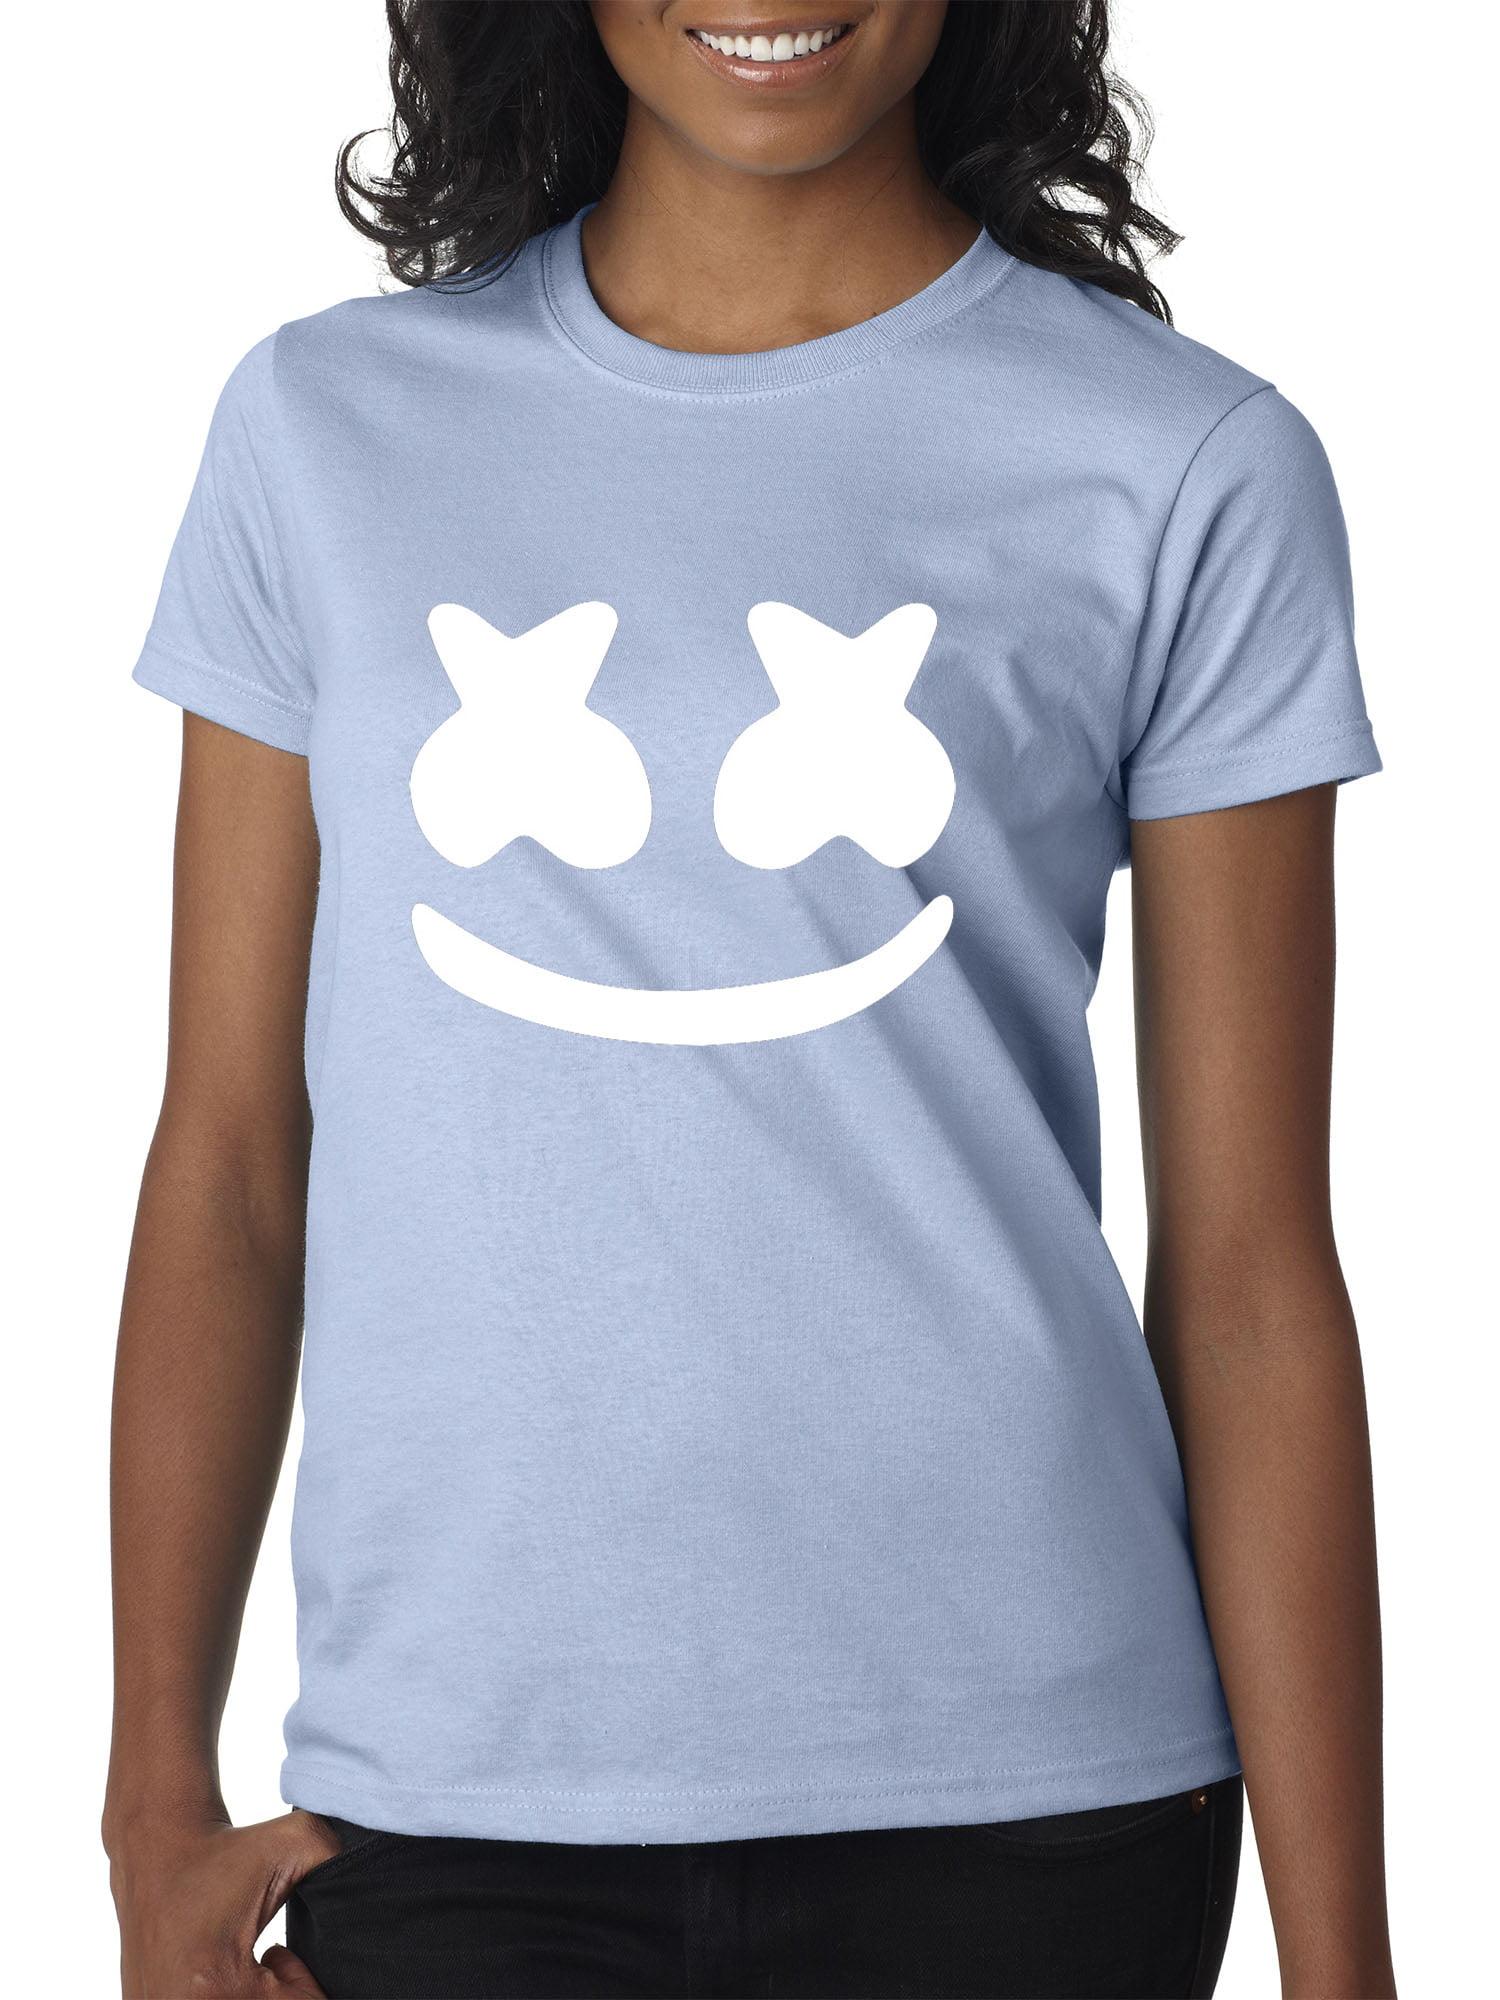 New Way 984 Youth T-Shirt Marshmello DJ Smiley Face